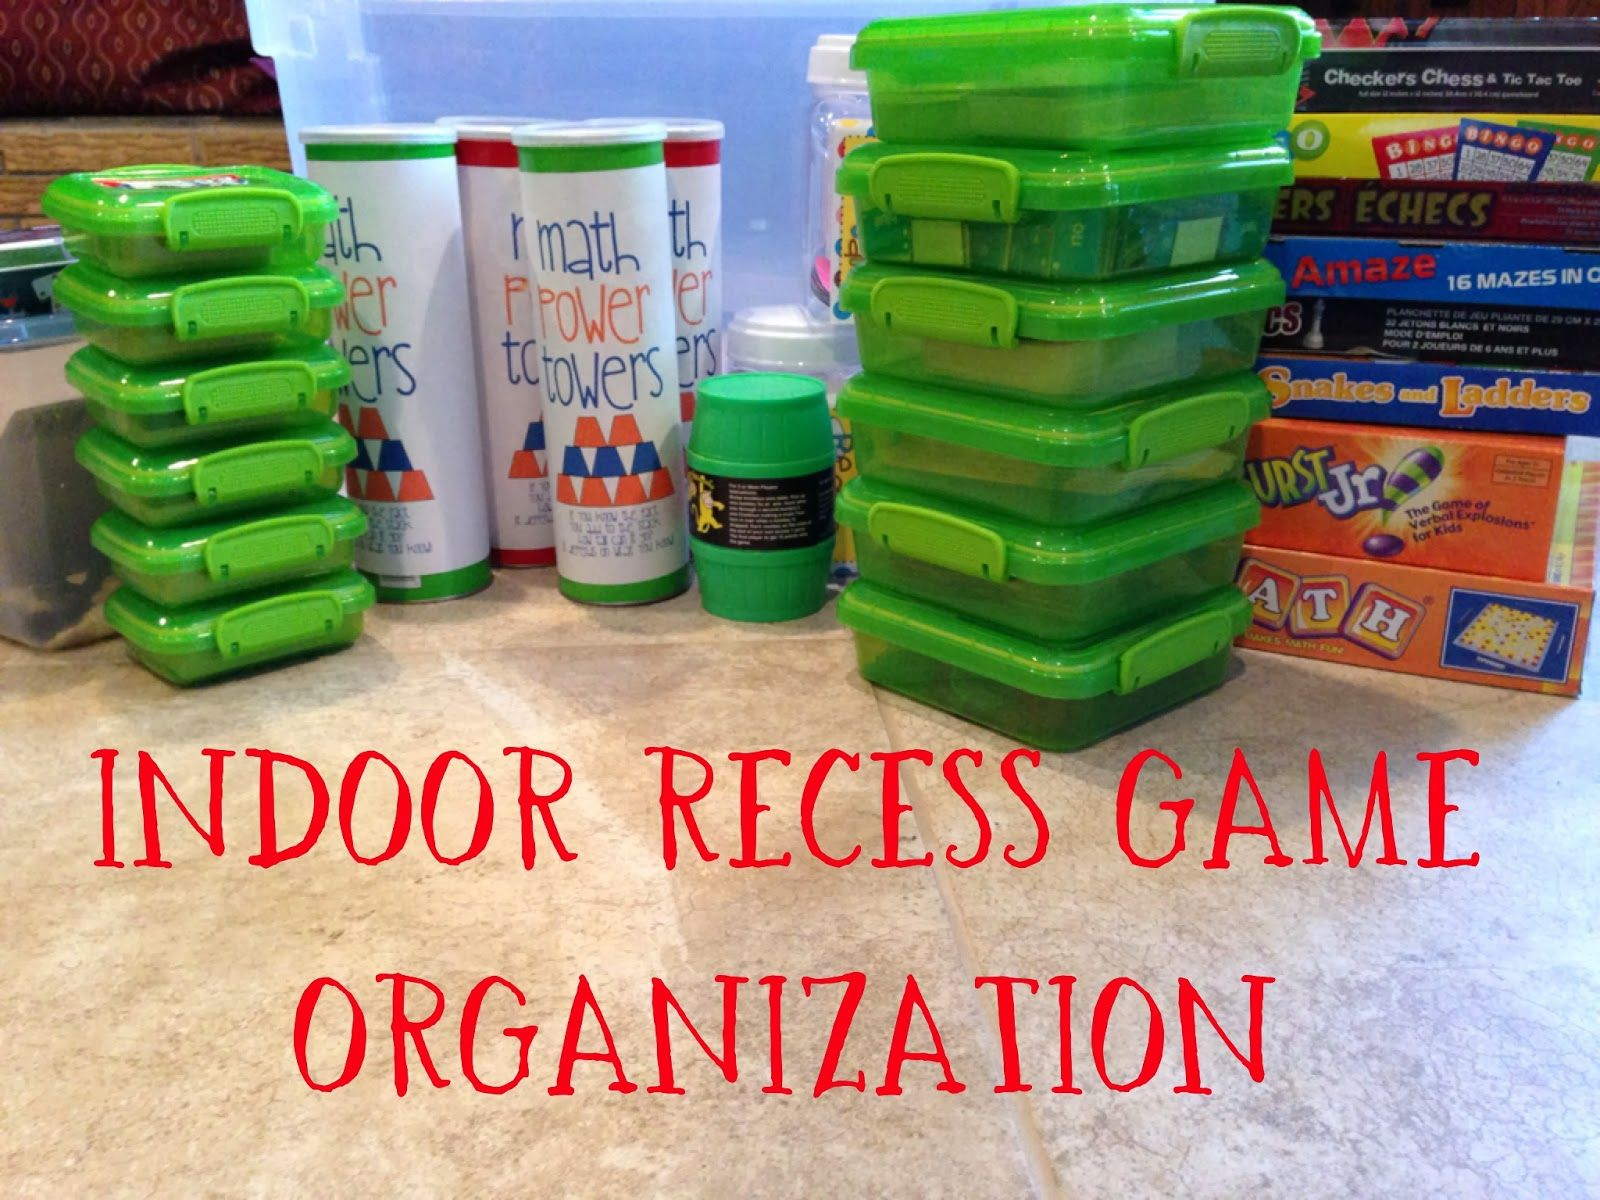 Indoor Recess Game Organization